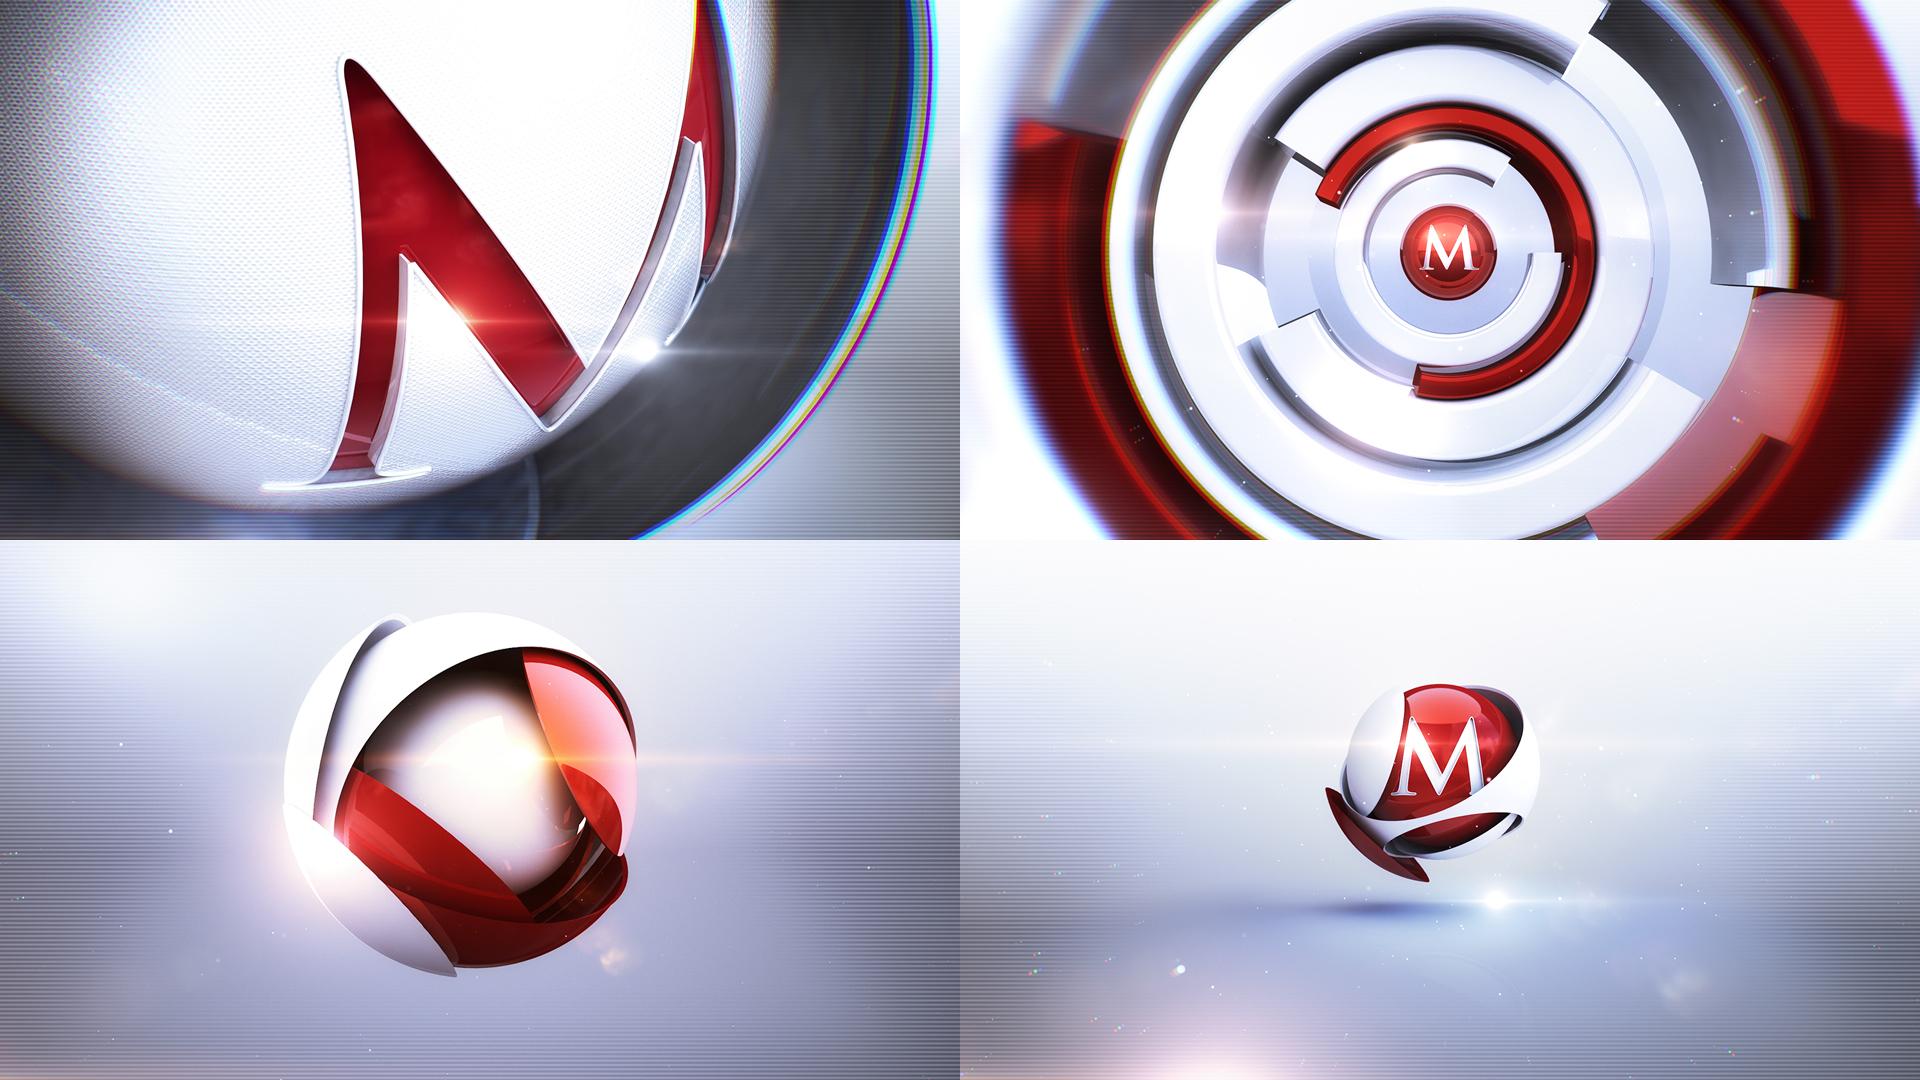 Milenio_Design_06.jpg